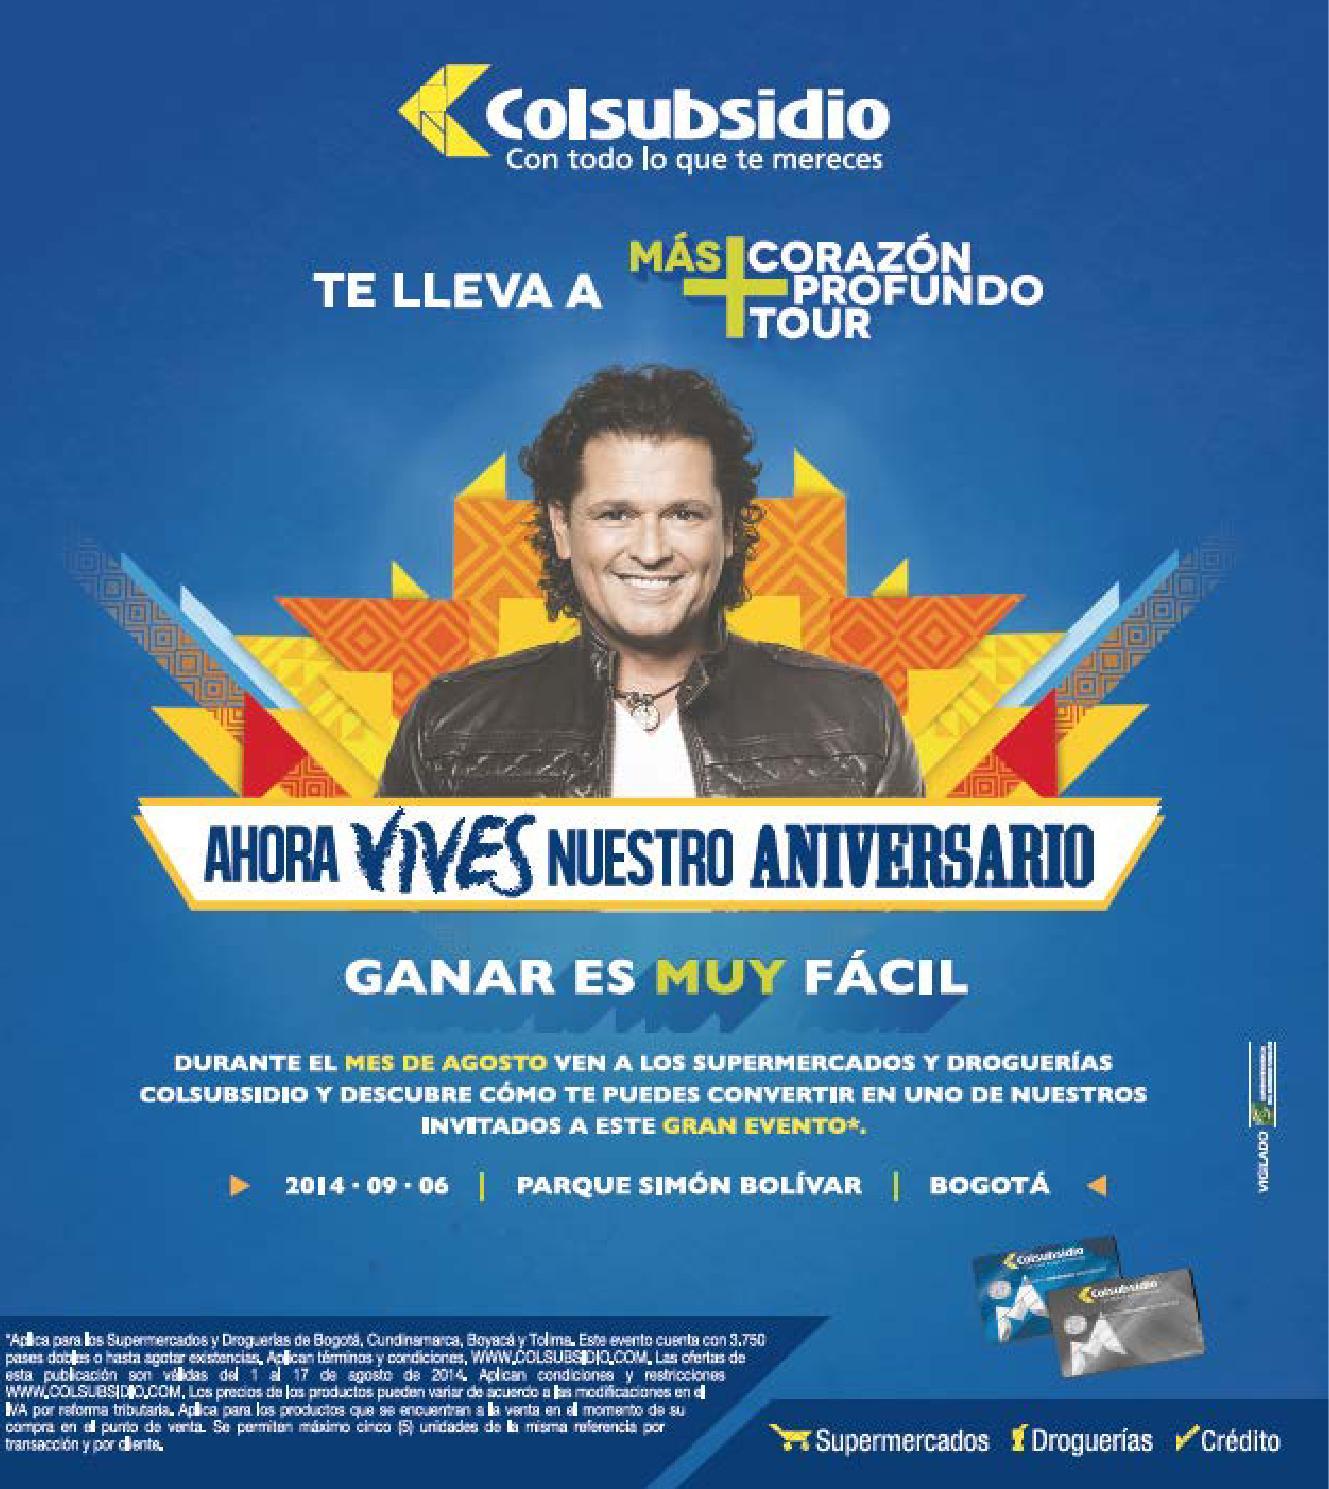 Catálogo 1-17 Agosto 2014 by Colsubsidio - issuu